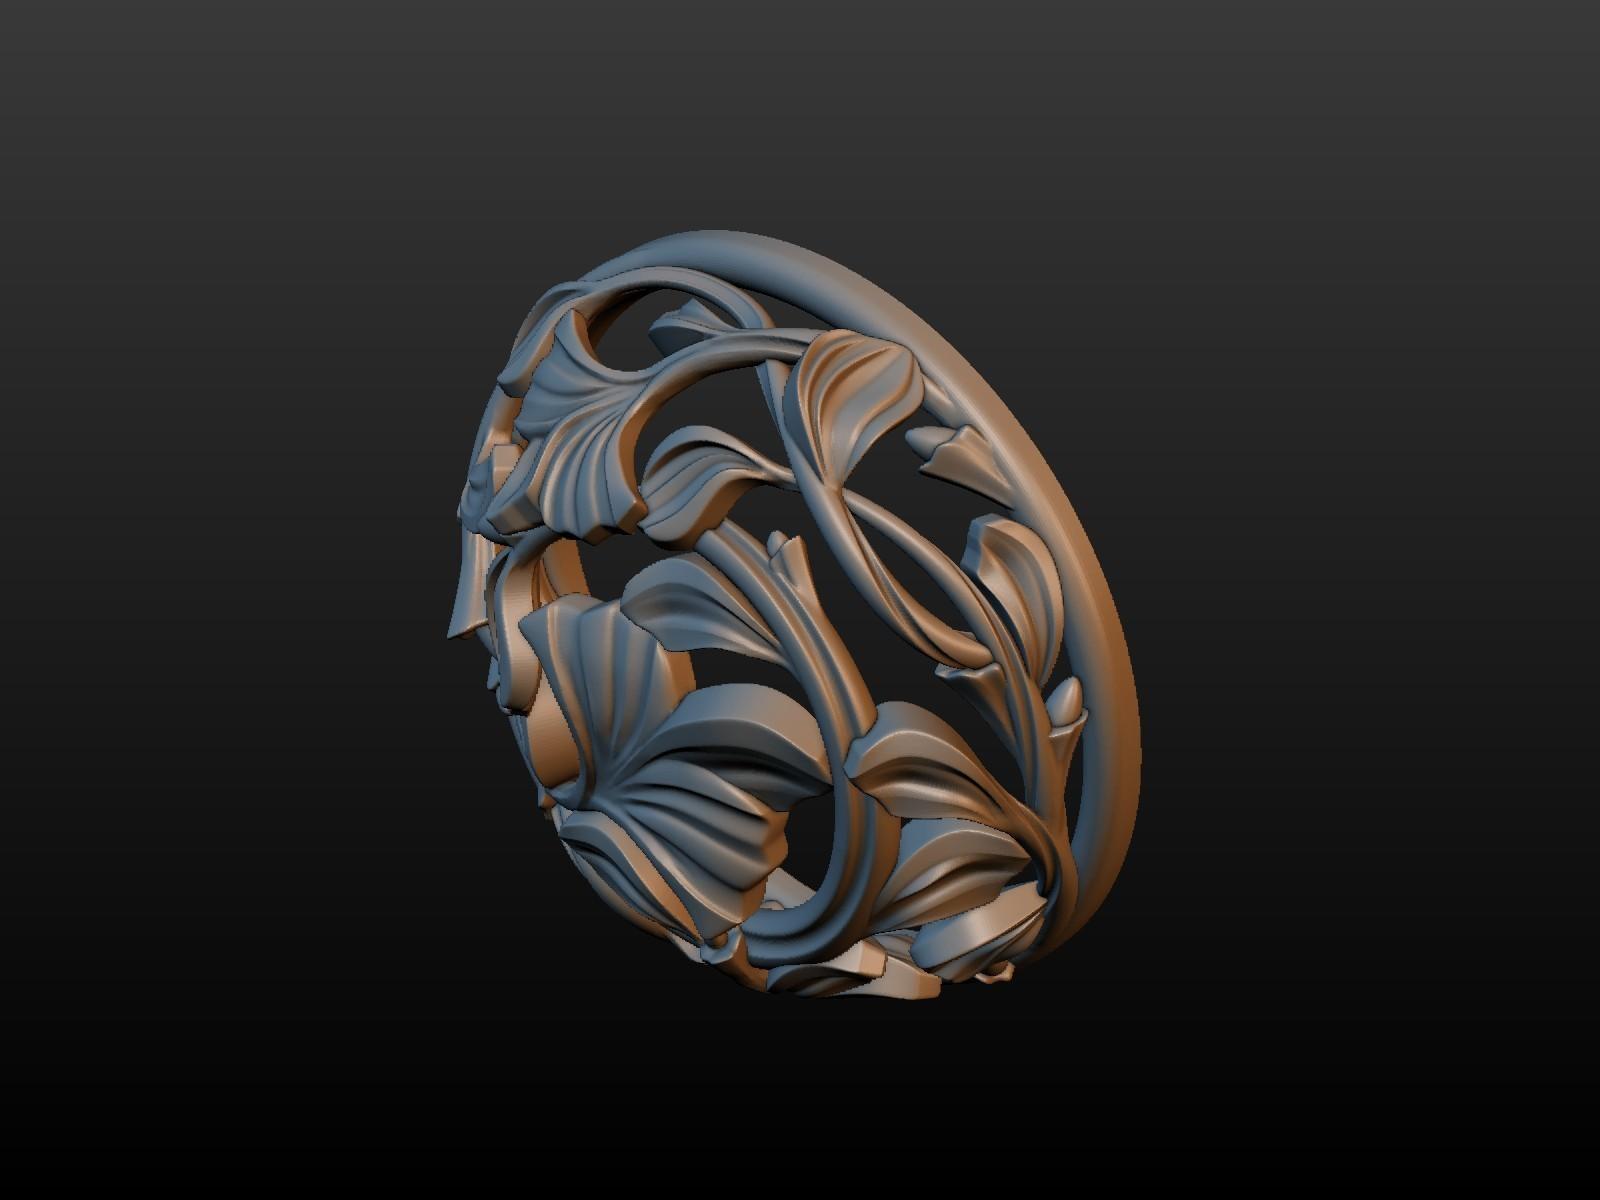 Earring-03.jpg Download STL file Earring • 3D printing template, Skazok